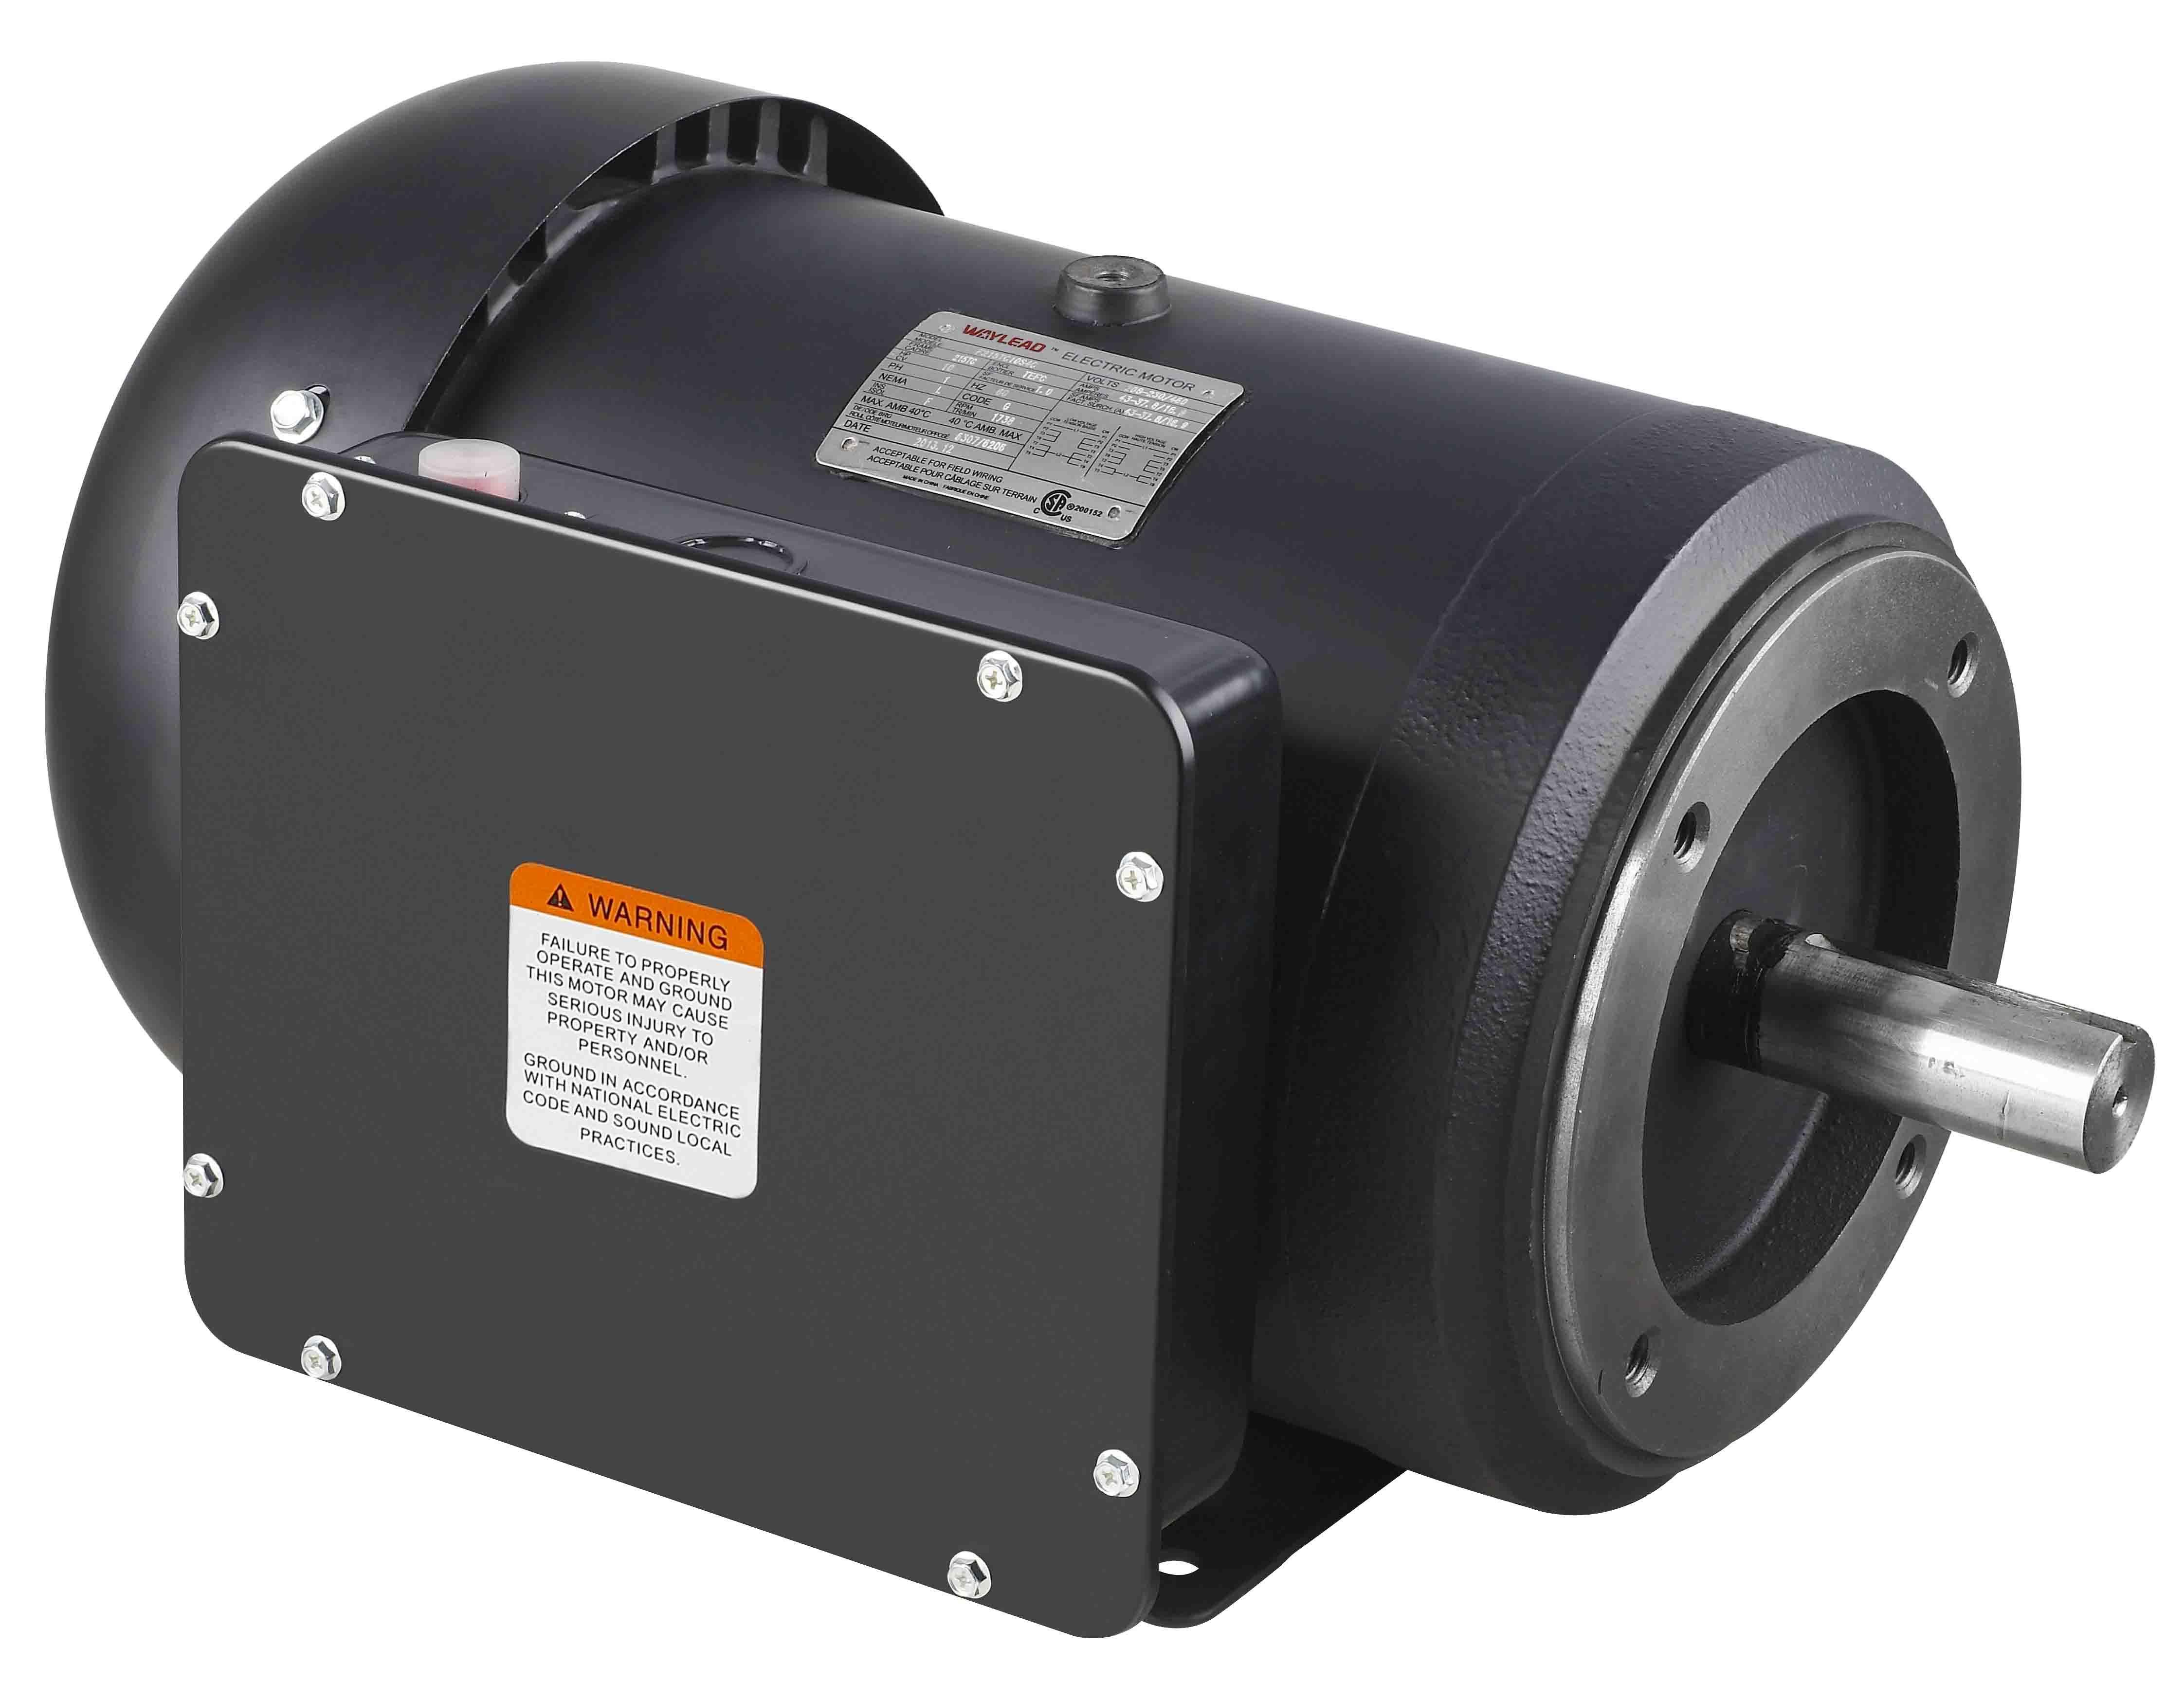 Single Phase Compressor : China single phase air compressor ac nema motor photos